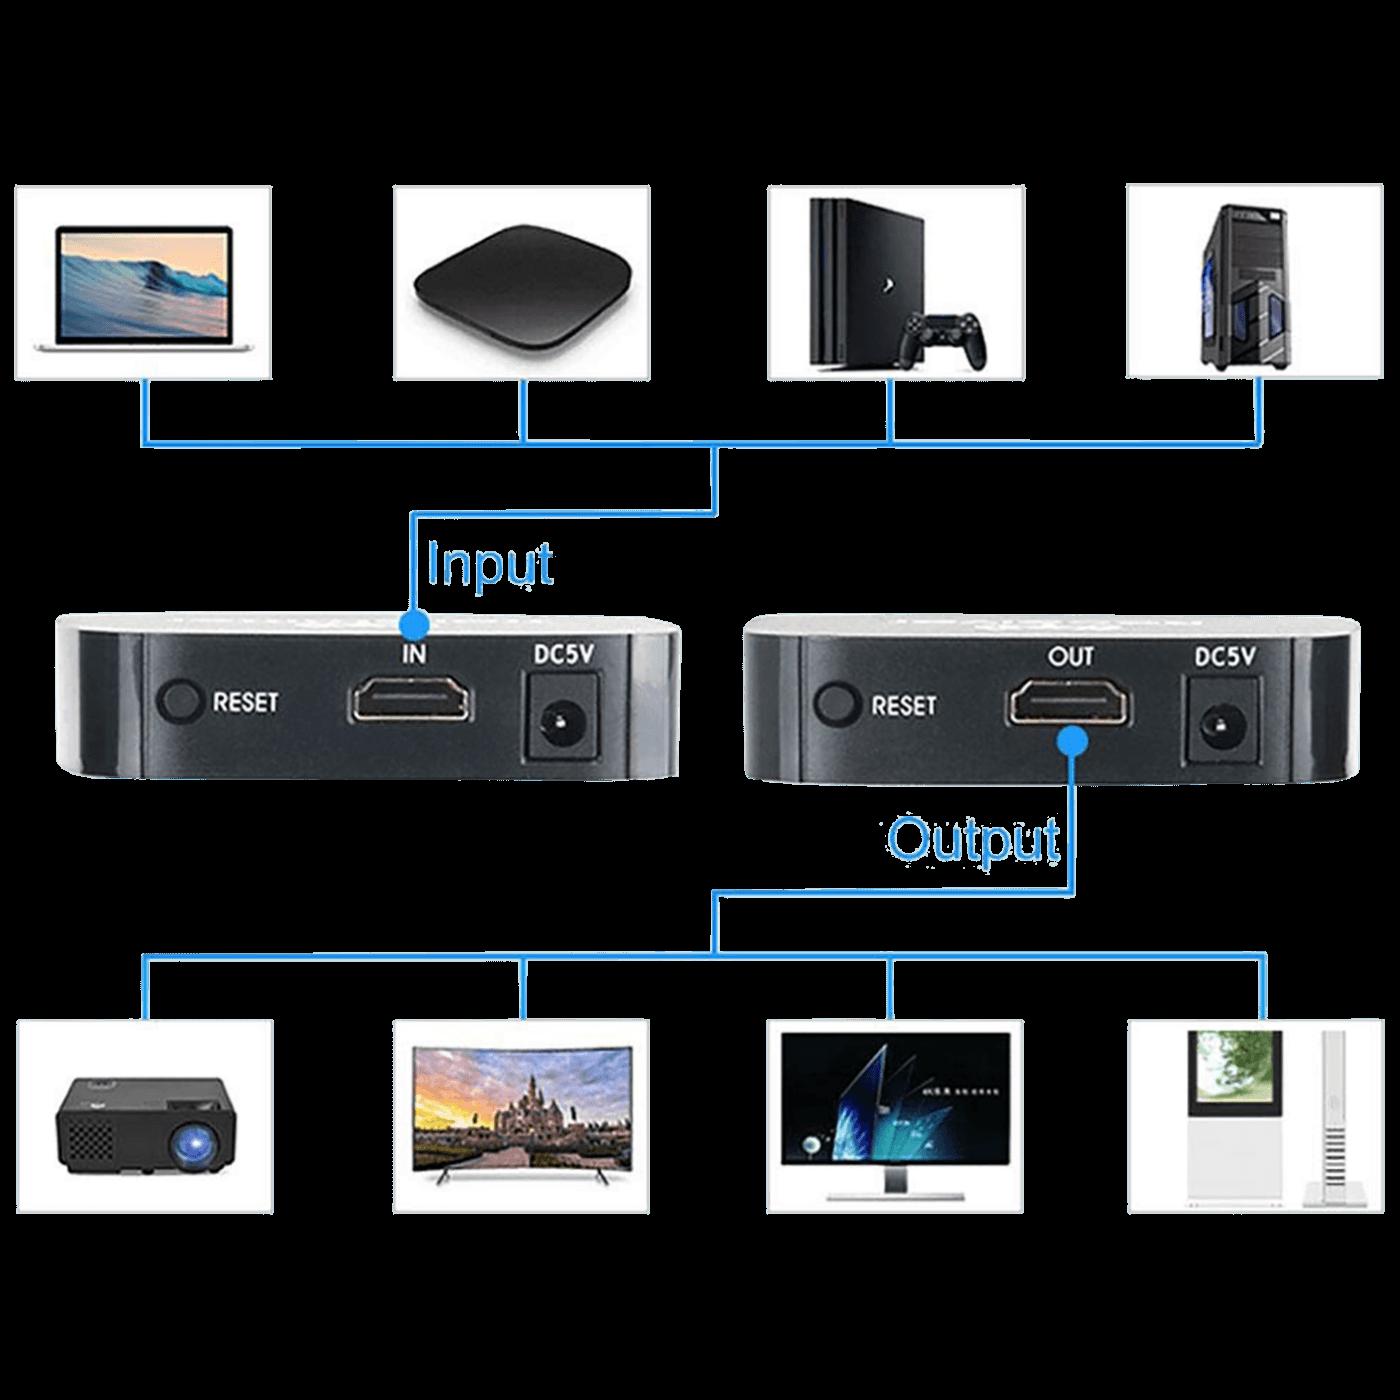 Bežični HDMI prijemnik, Full HD, H.264, WiFi 2.4 / 5 GHz